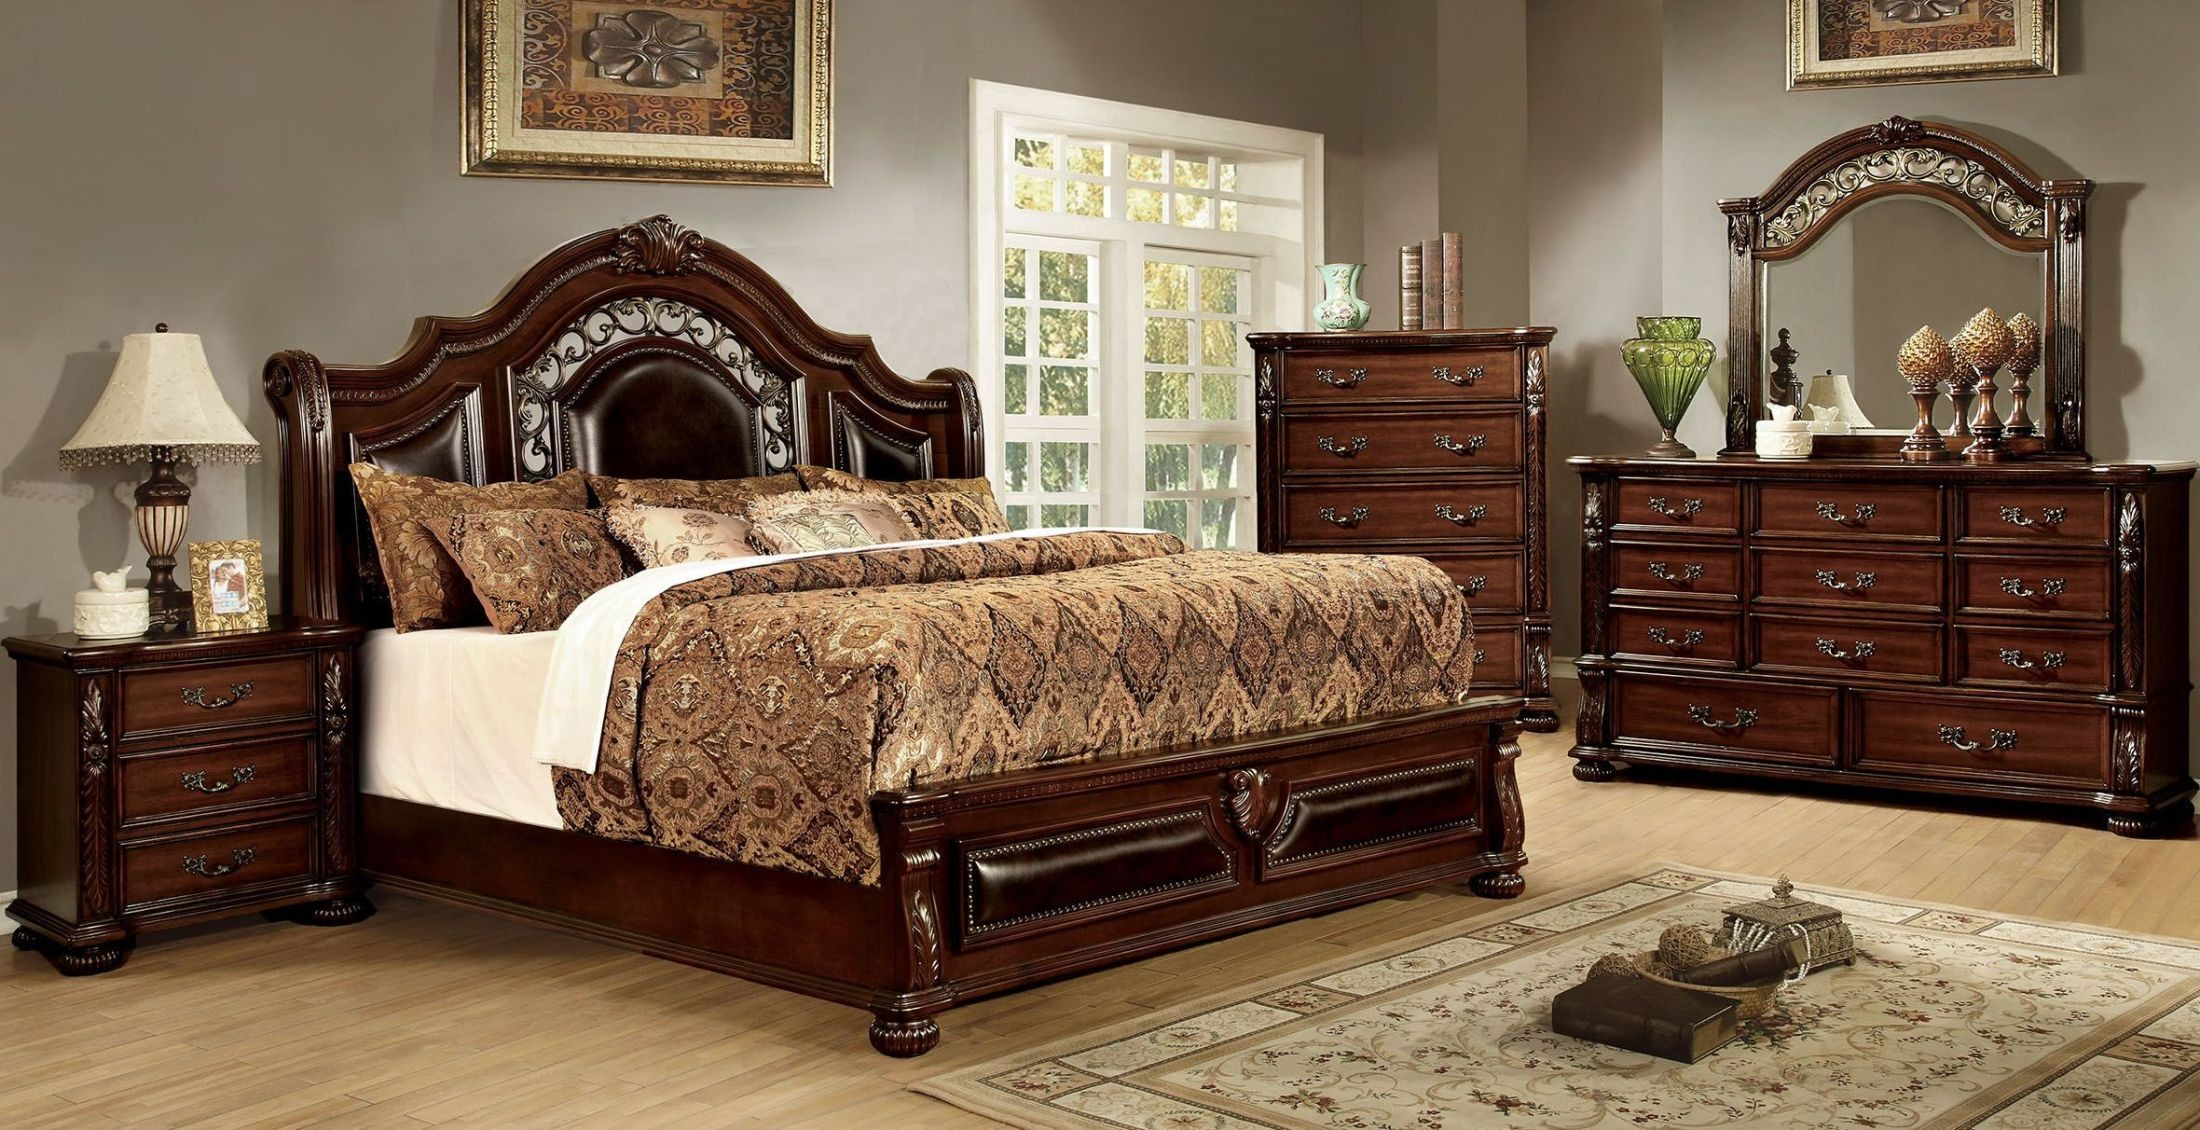 flandreau brown panel bedroom set from furniture of america coleman furniture